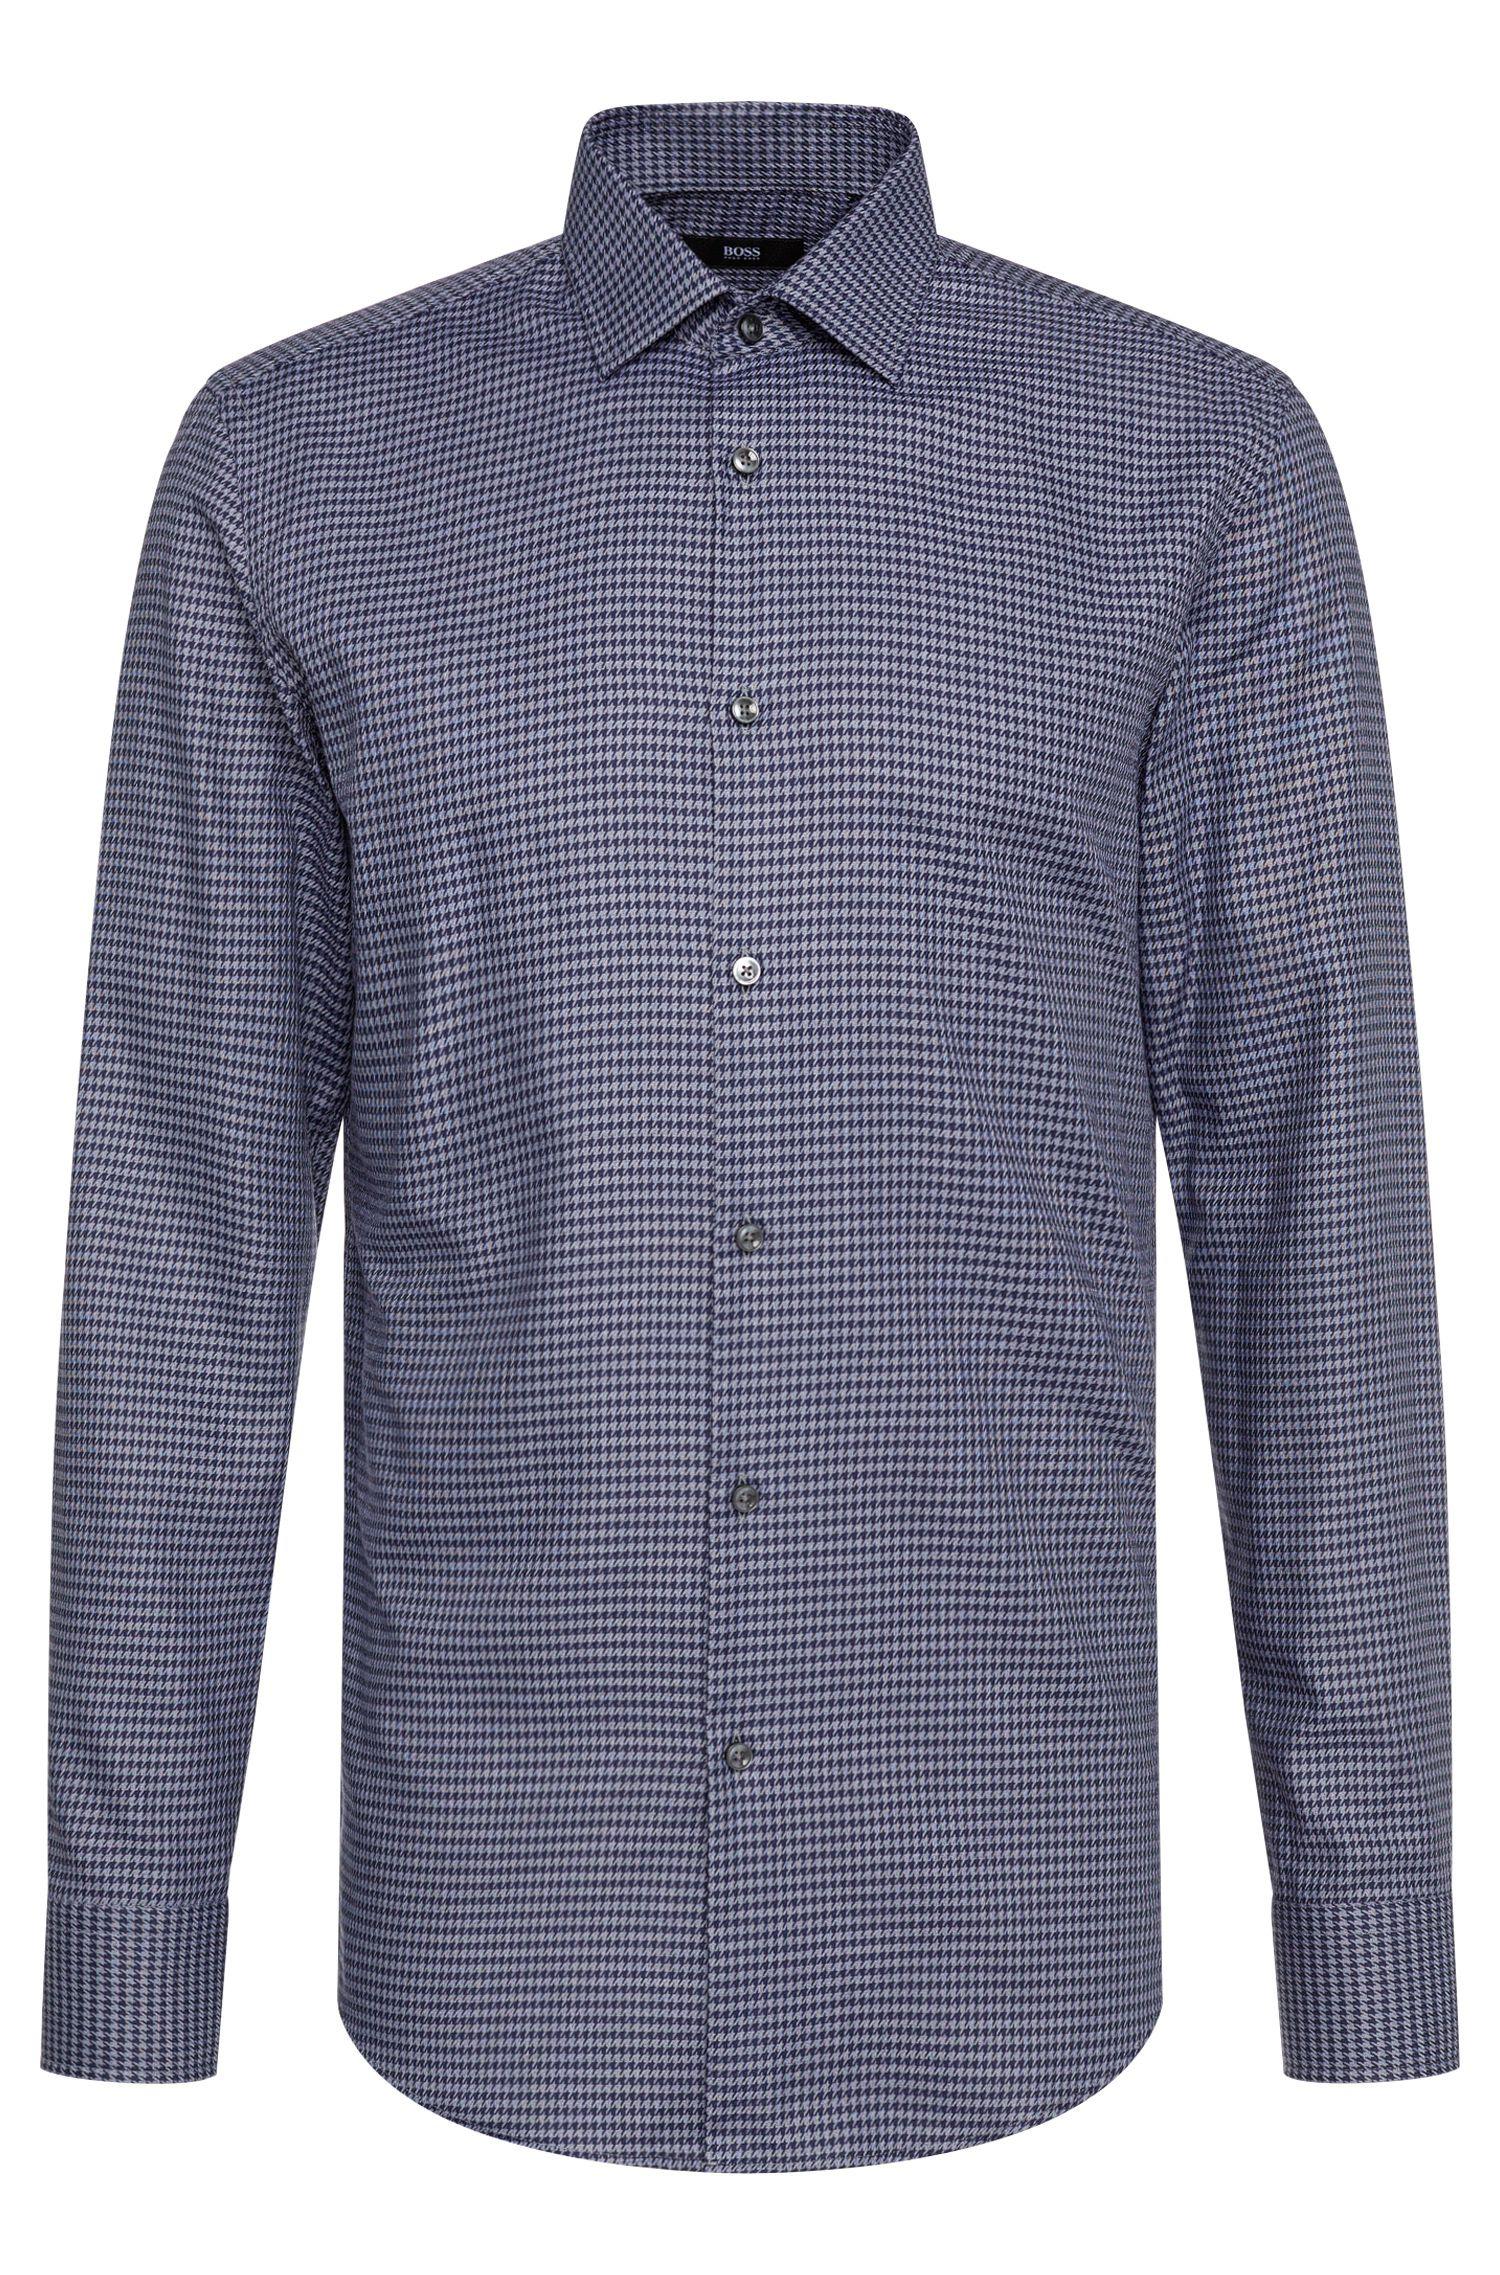 Slim-fit overhemd van katoen met pied-de-poule patroon: 'Jenno'